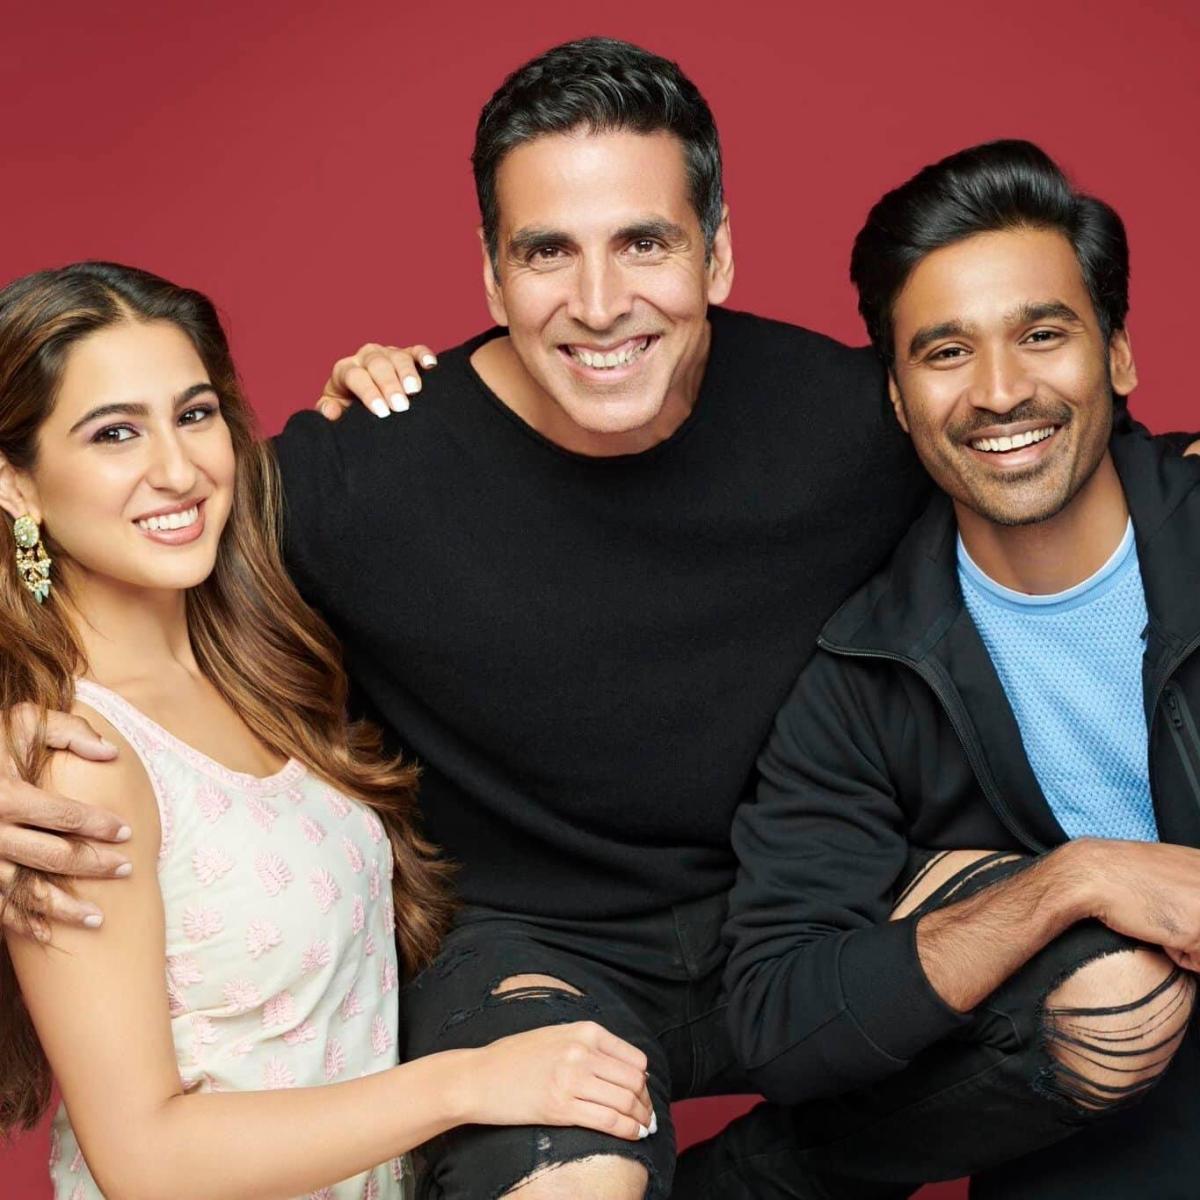 Atrangi Re: Aanand L Rai to put Akshay Kumar, Sara Ali Khan and Dhanush in an 'unseen space'